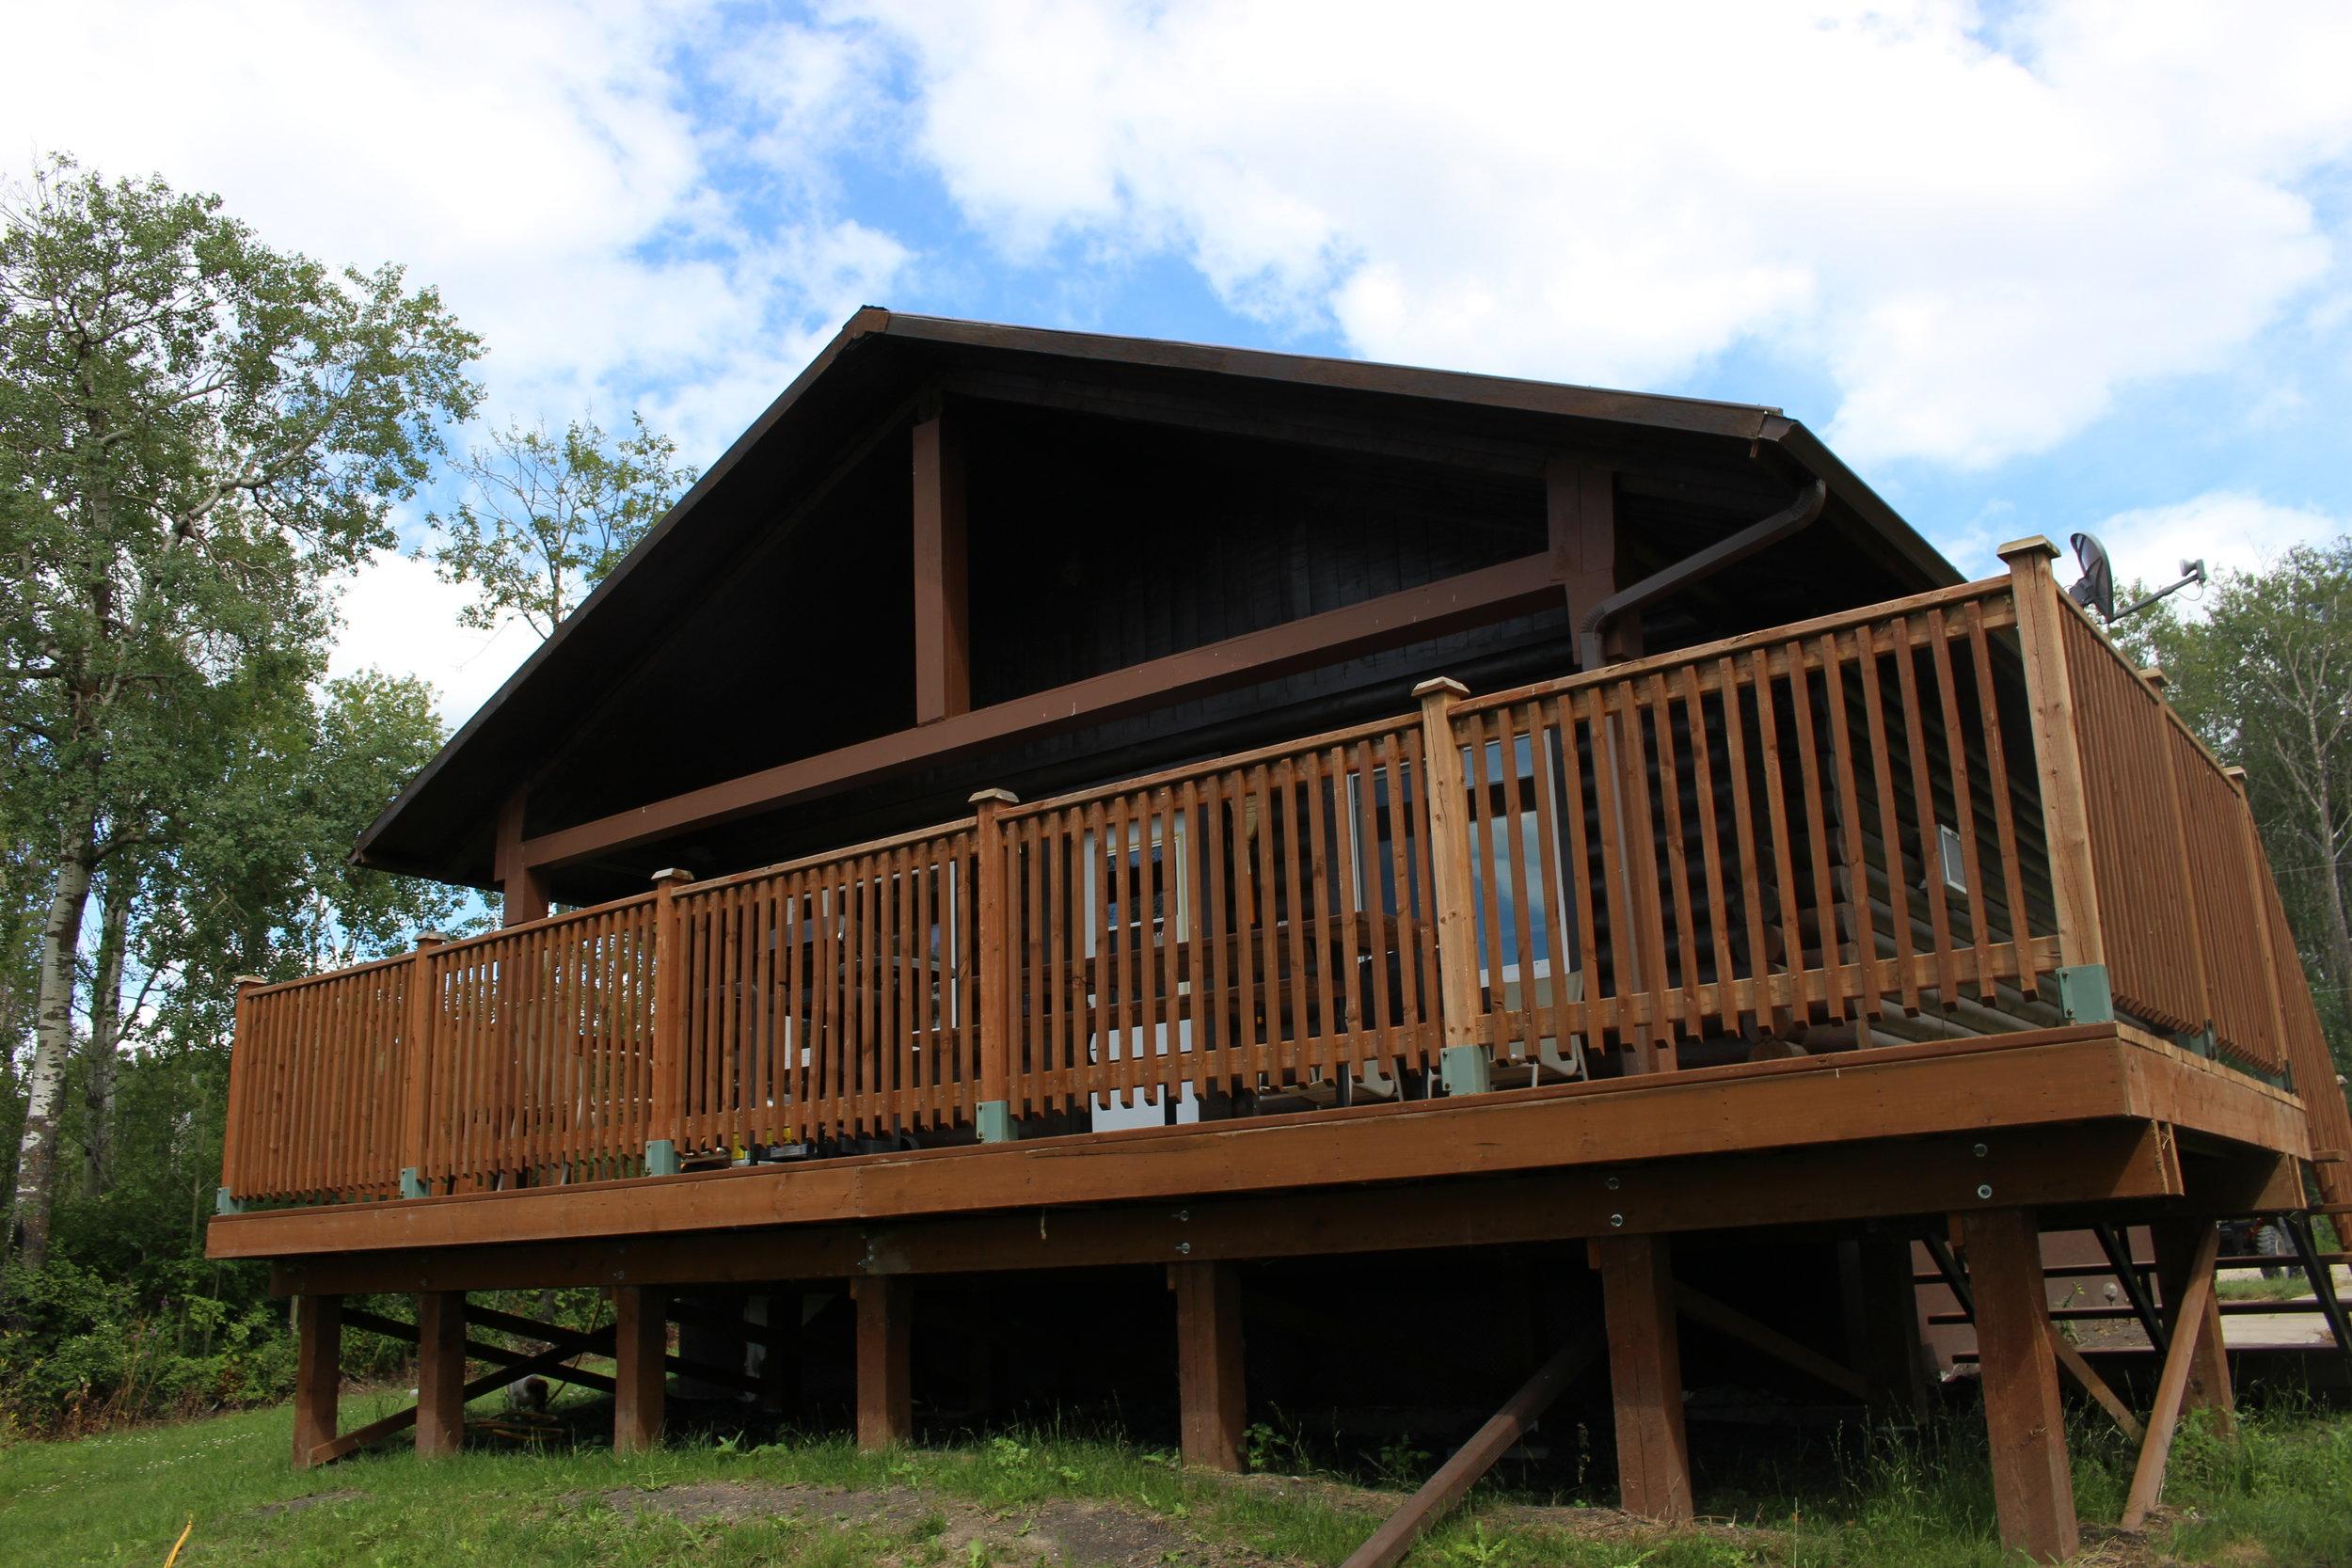 Lake view side of Arrow Lake Ranch's cabin